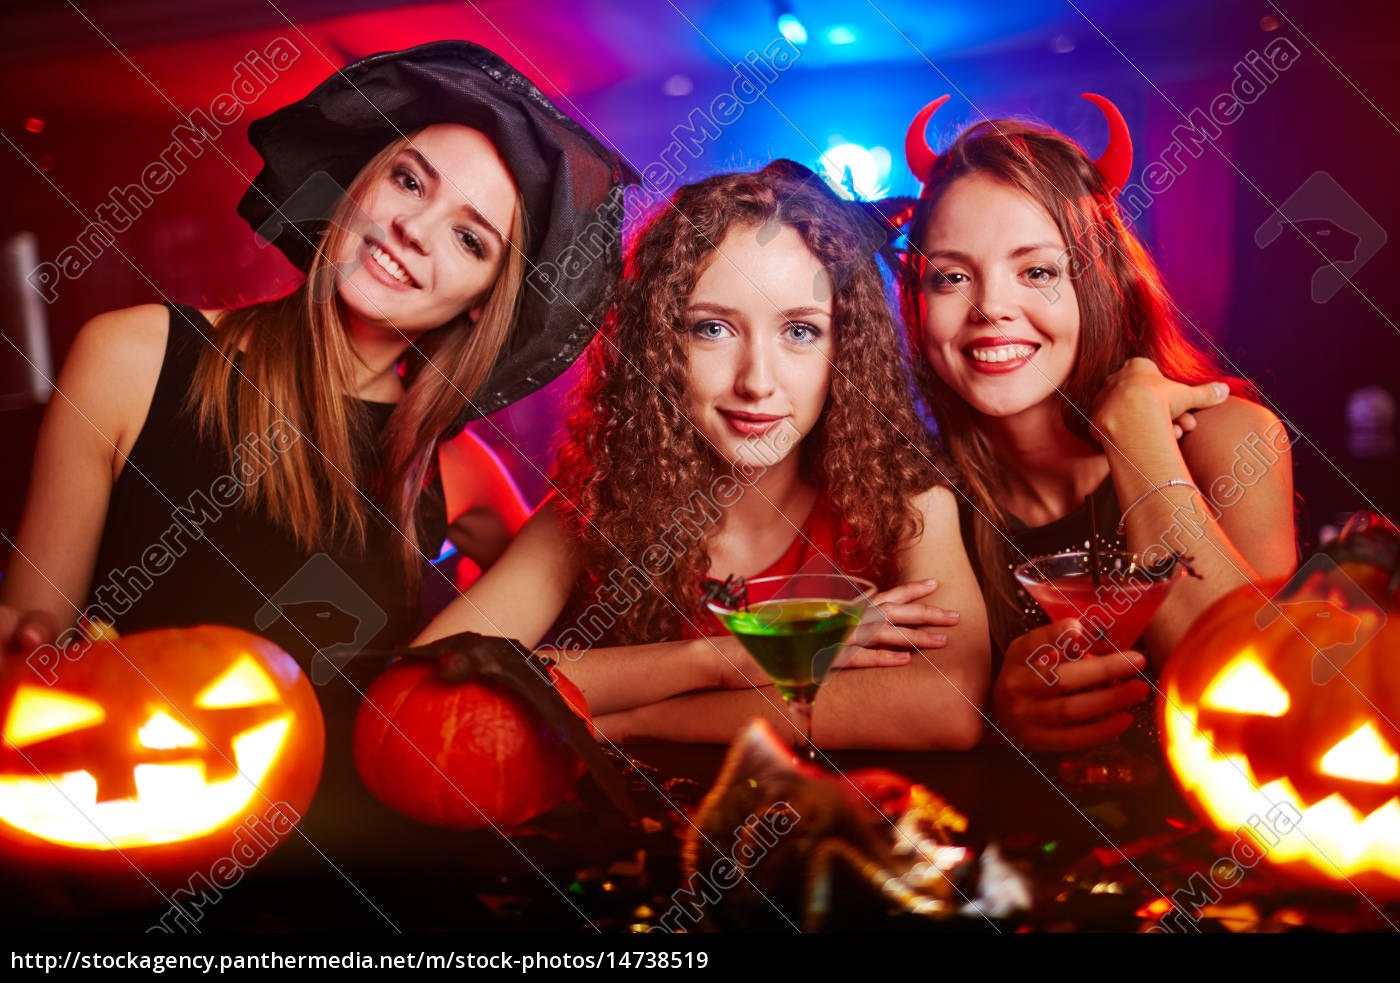 Конкурсы на хэллоуина взрослые